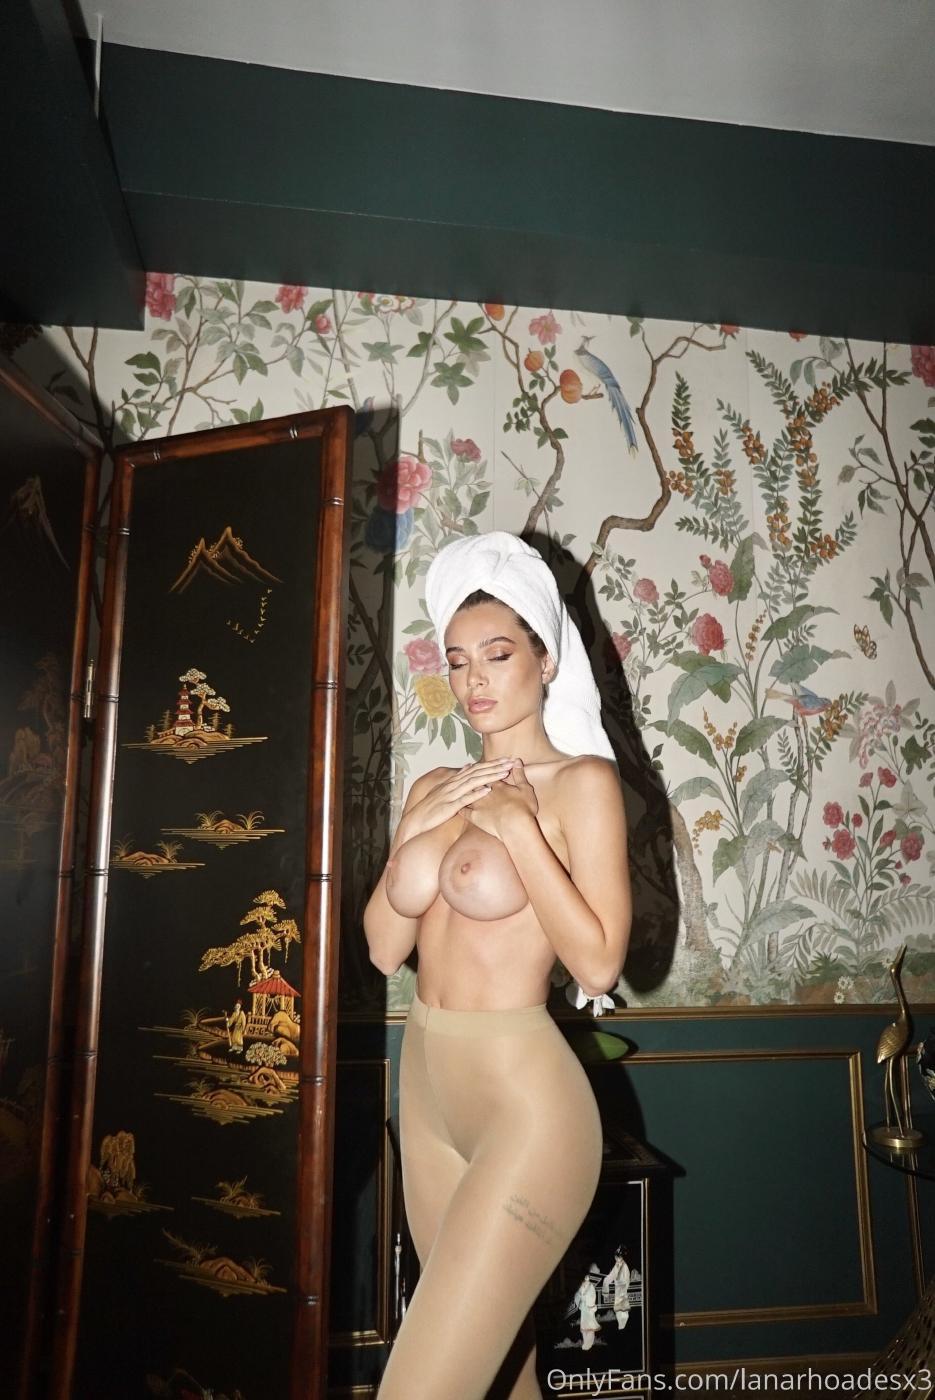 Lana Rhoades Nude Lingerie Strip Onlyfans Set Leaked Oqydja